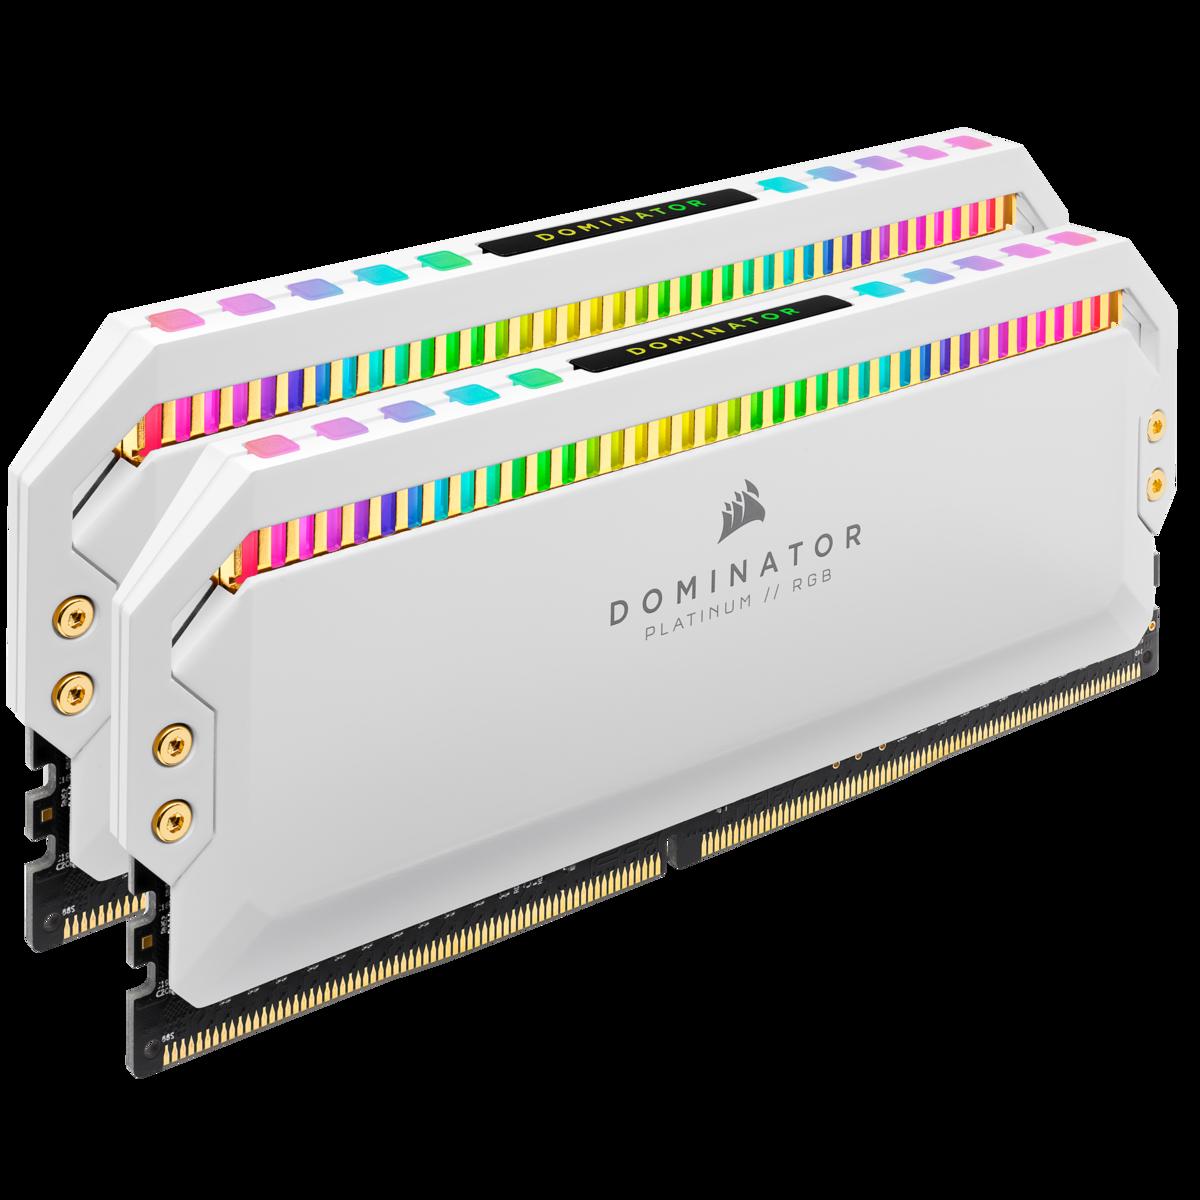 Memória DDR4 Corsair Dominator Platinum RGB, White, 32GB (2x16GB), 3200MHz, CMT32GX4M2C3200C16W